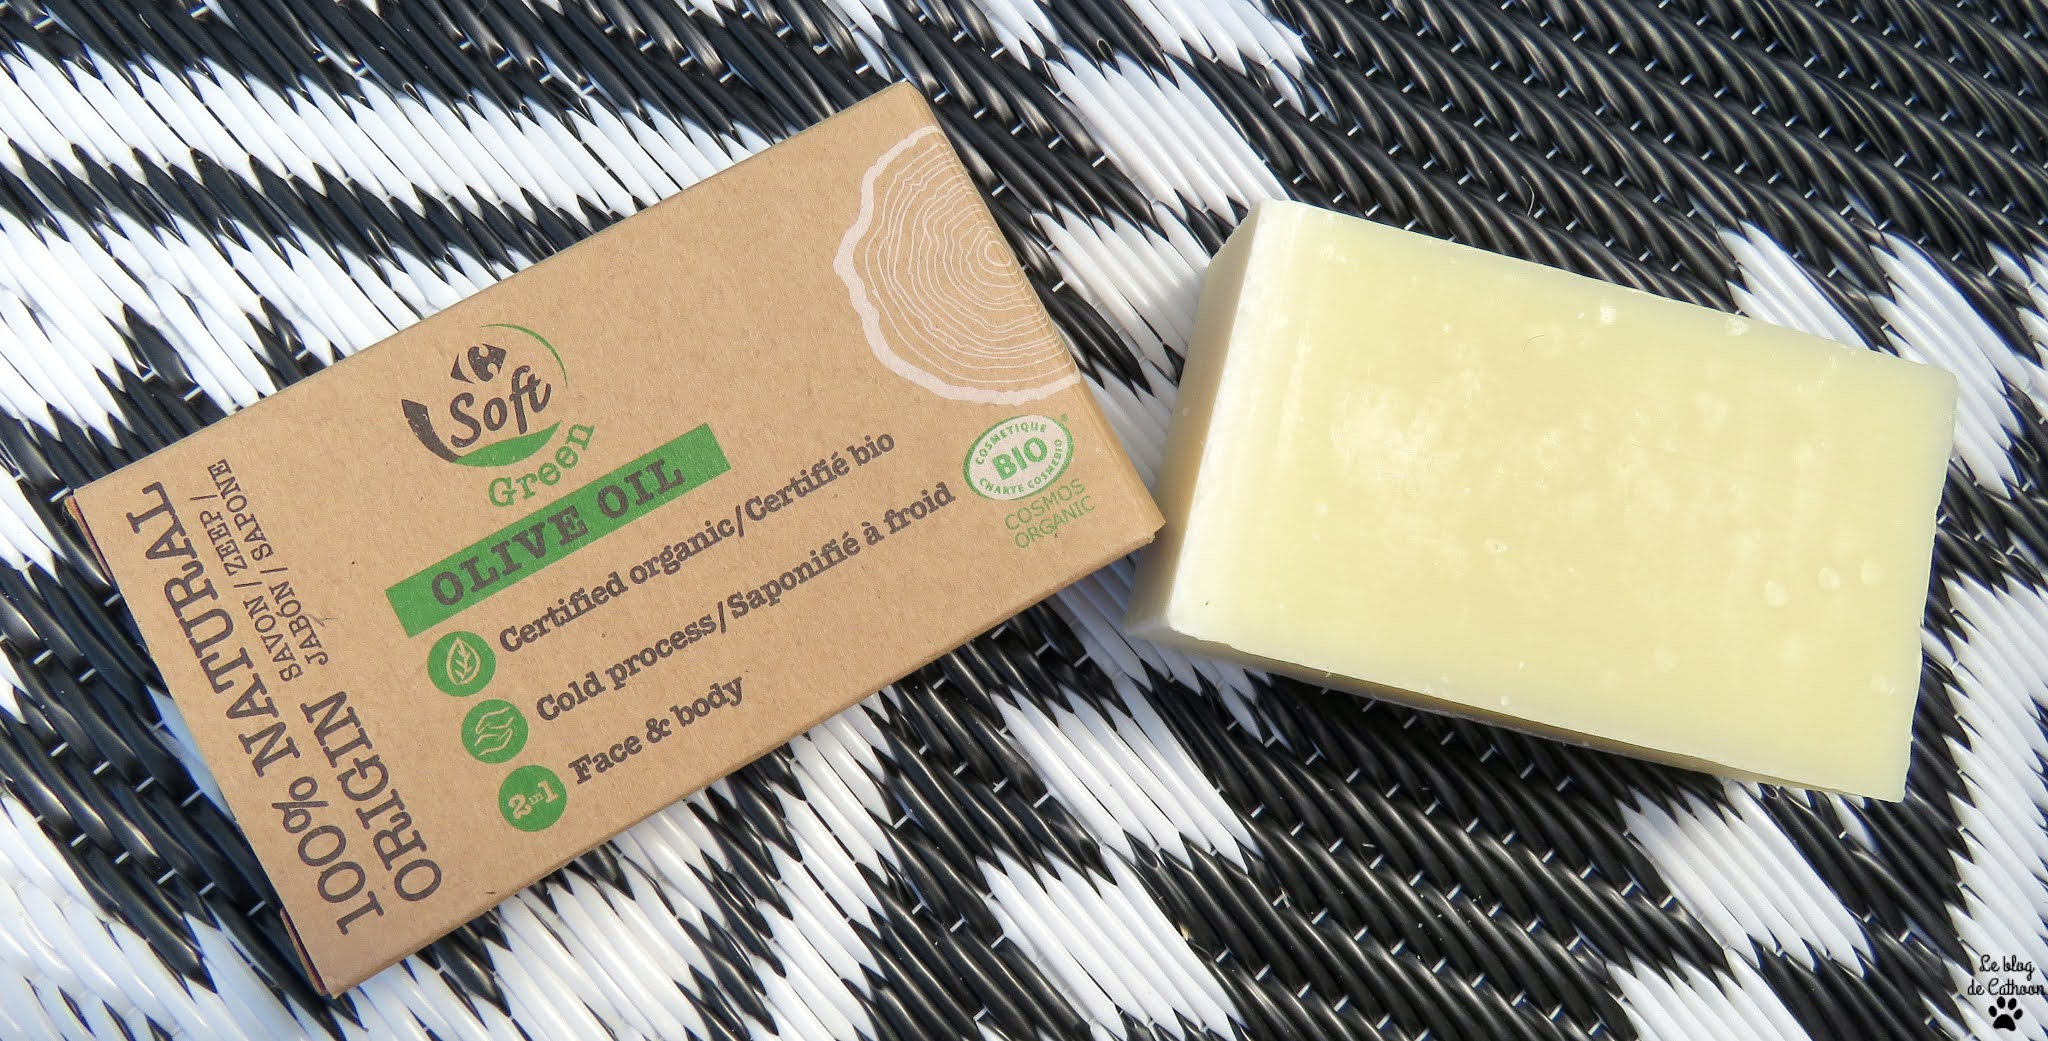 Olive Oil - Savon - Soft Green (Carrefour)